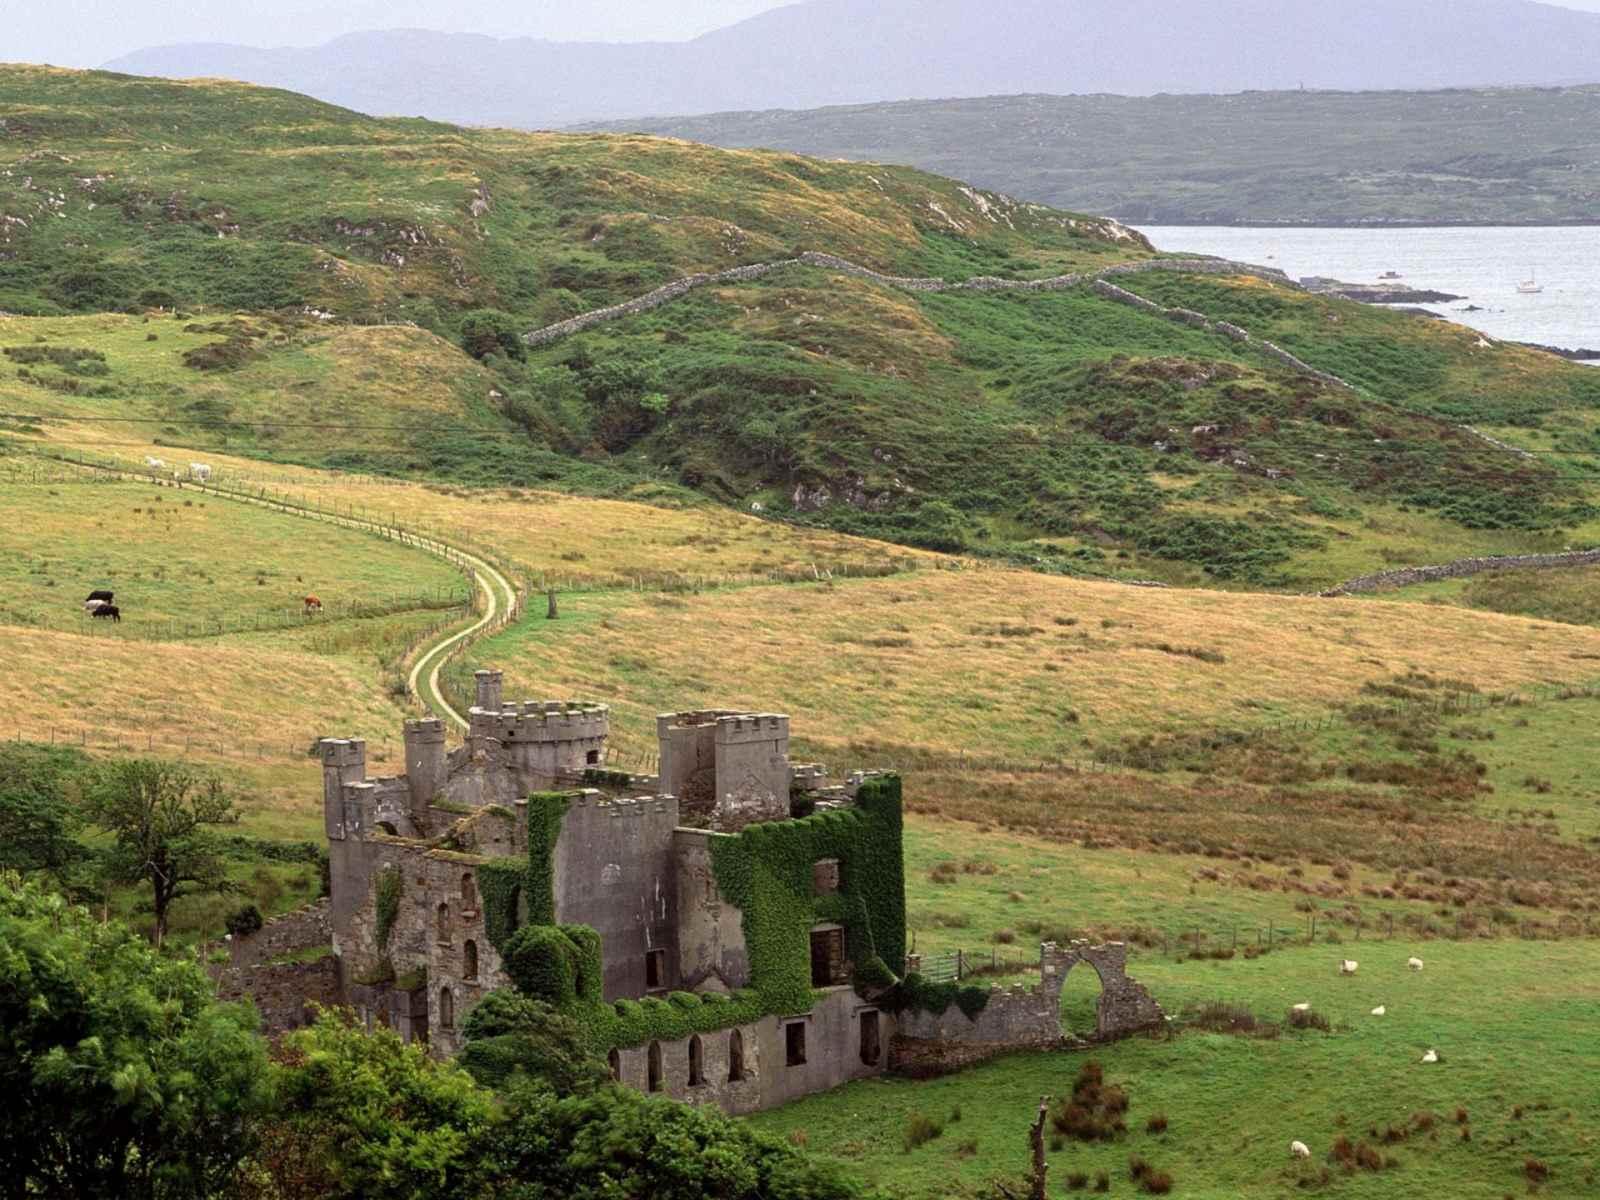 http://3.bp.blogspot.com/-tH6Hq8gY-cs/T2Df08anzwI/AAAAAAAABiI/YSOVG9HT4sk/s1600/21+Collection+1600X1200+Beautiful+Ireland+New+Webshot+Free+Wallpapers,_17+%5B1600x1200%5D.jpg